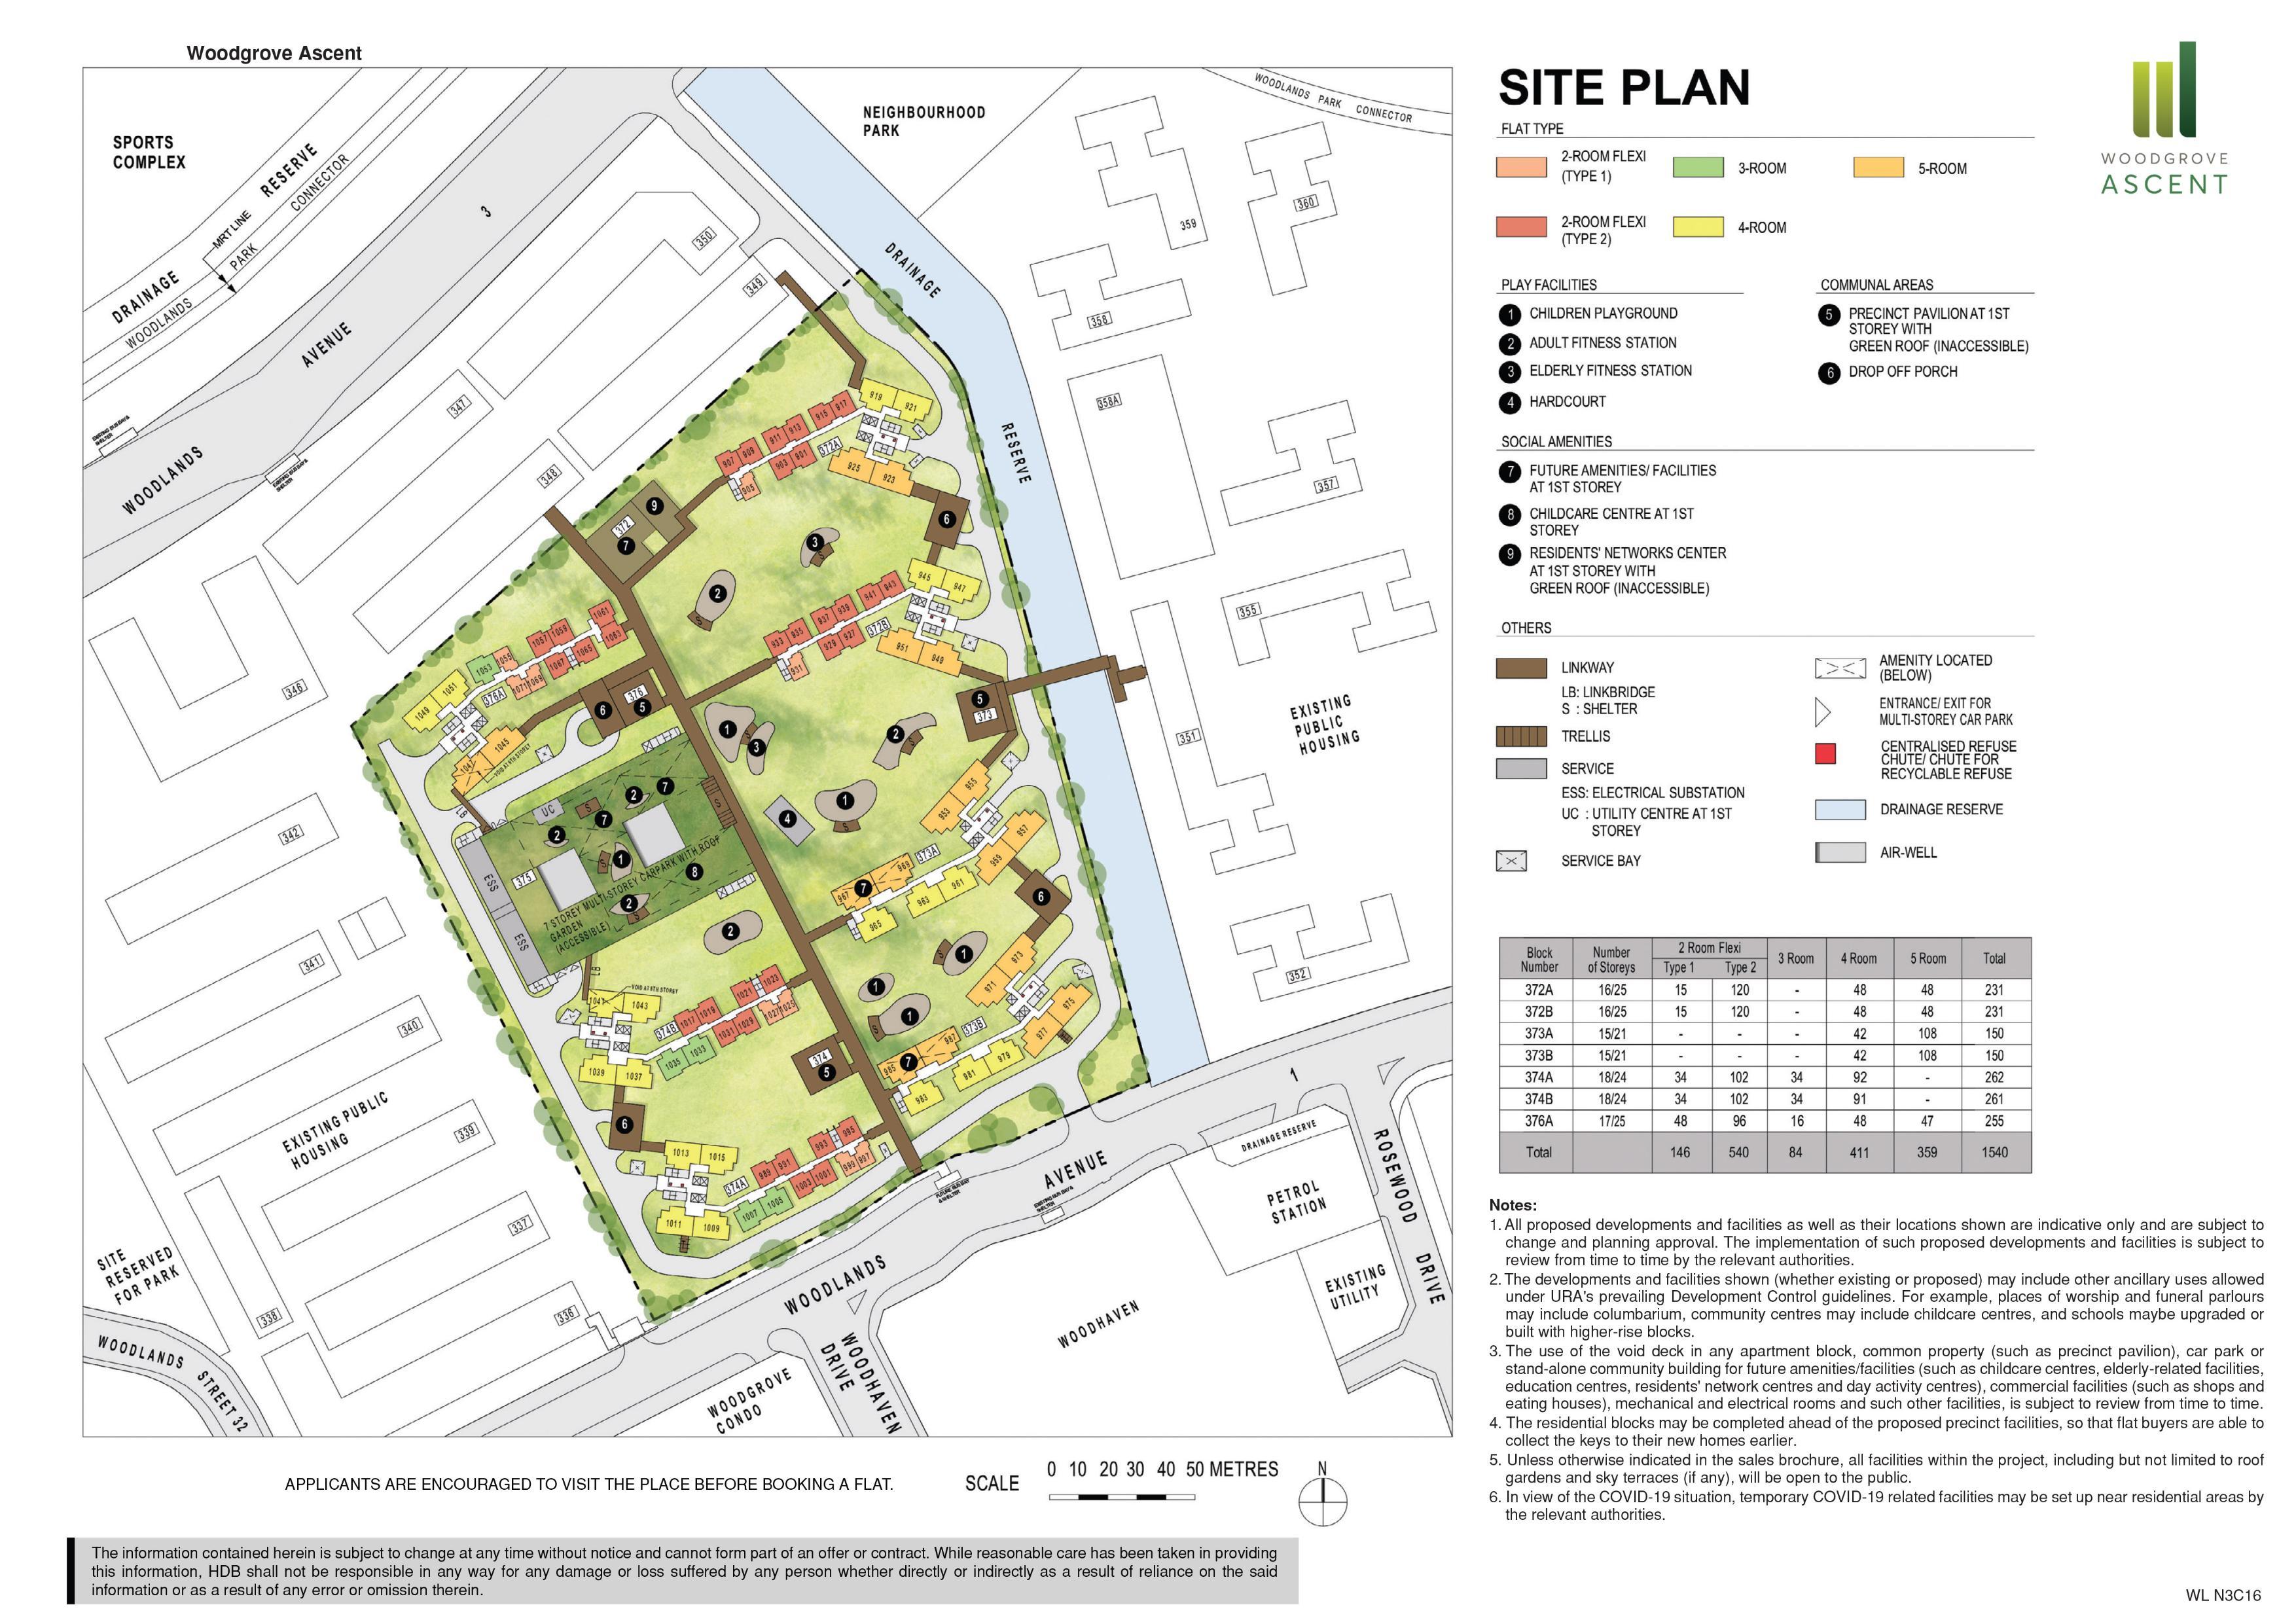 Woodgrove Ascent Site Plan